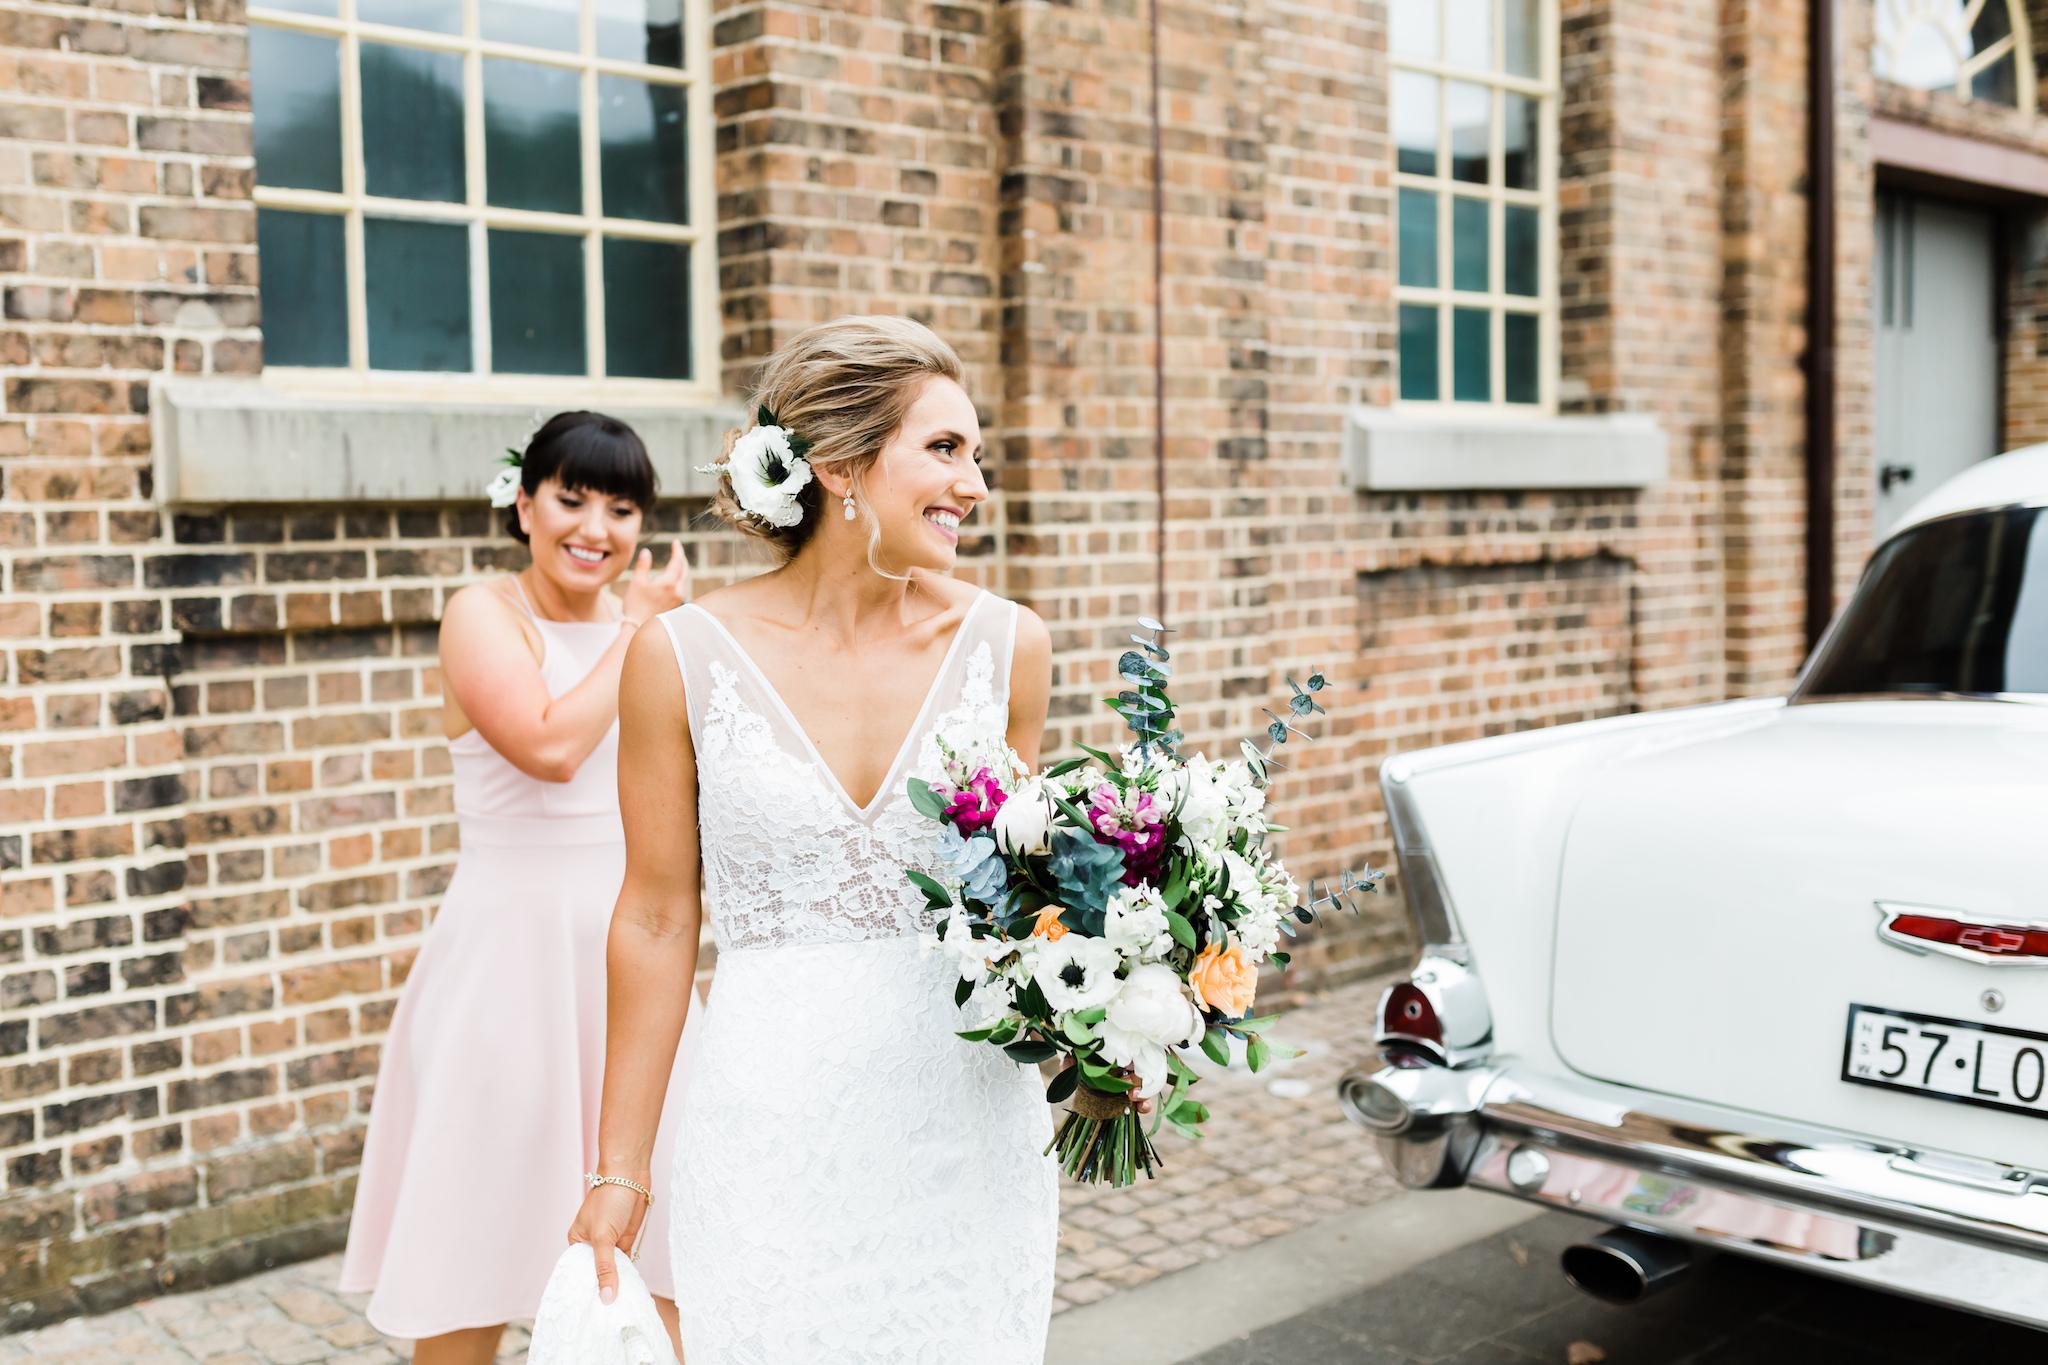 227-SOPHIE  DYLAN WEDDING.jpg